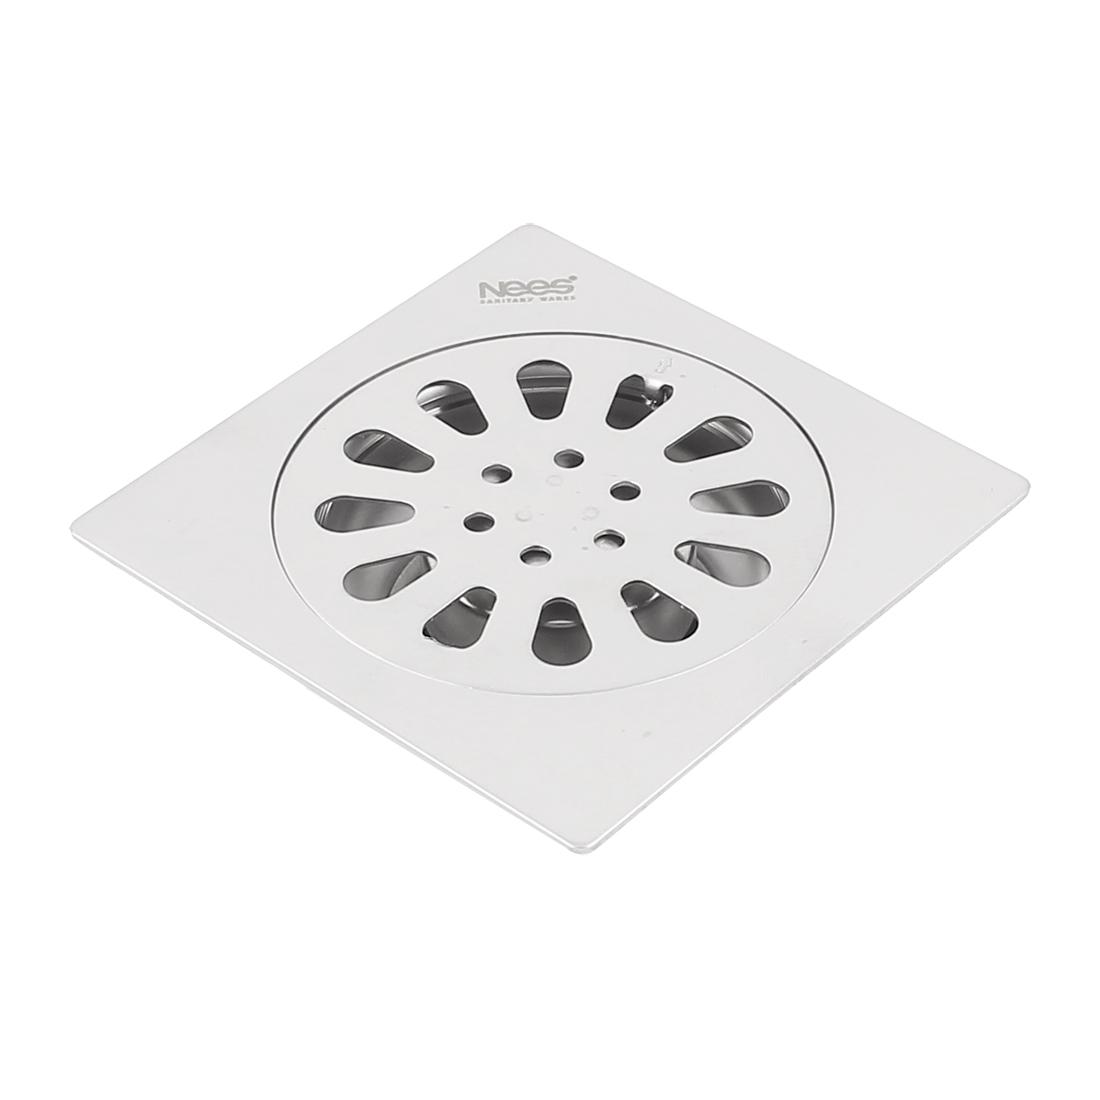 Bathroom Shower Square Floor Drain Strainer Sink Filter Silver Tone